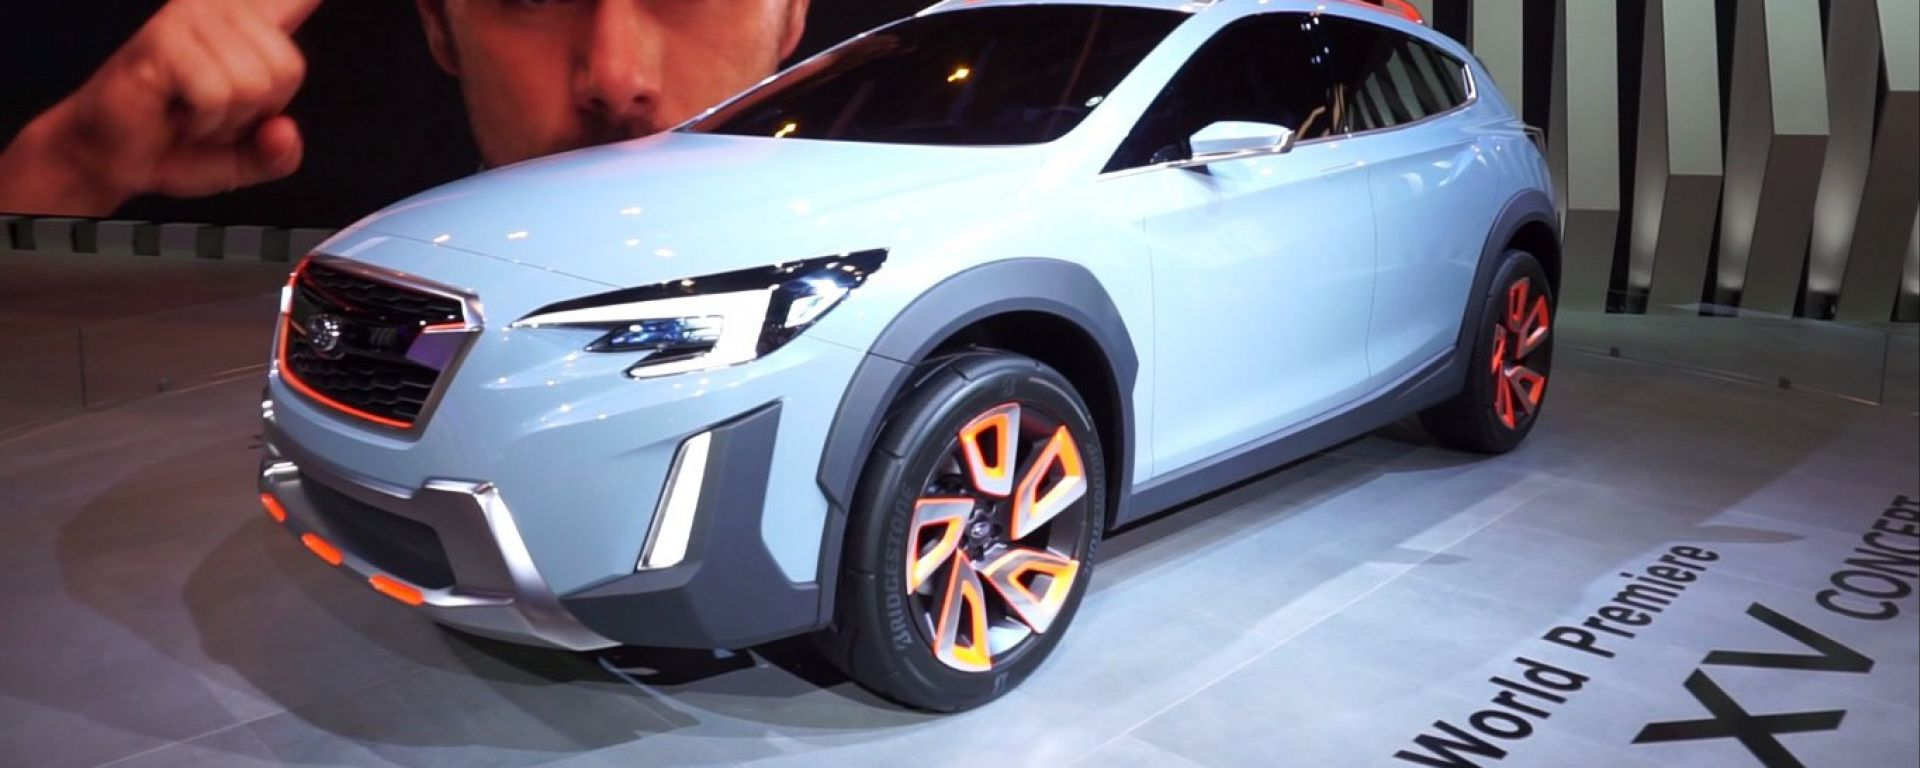 Ginevra 2016: le novità Subaru